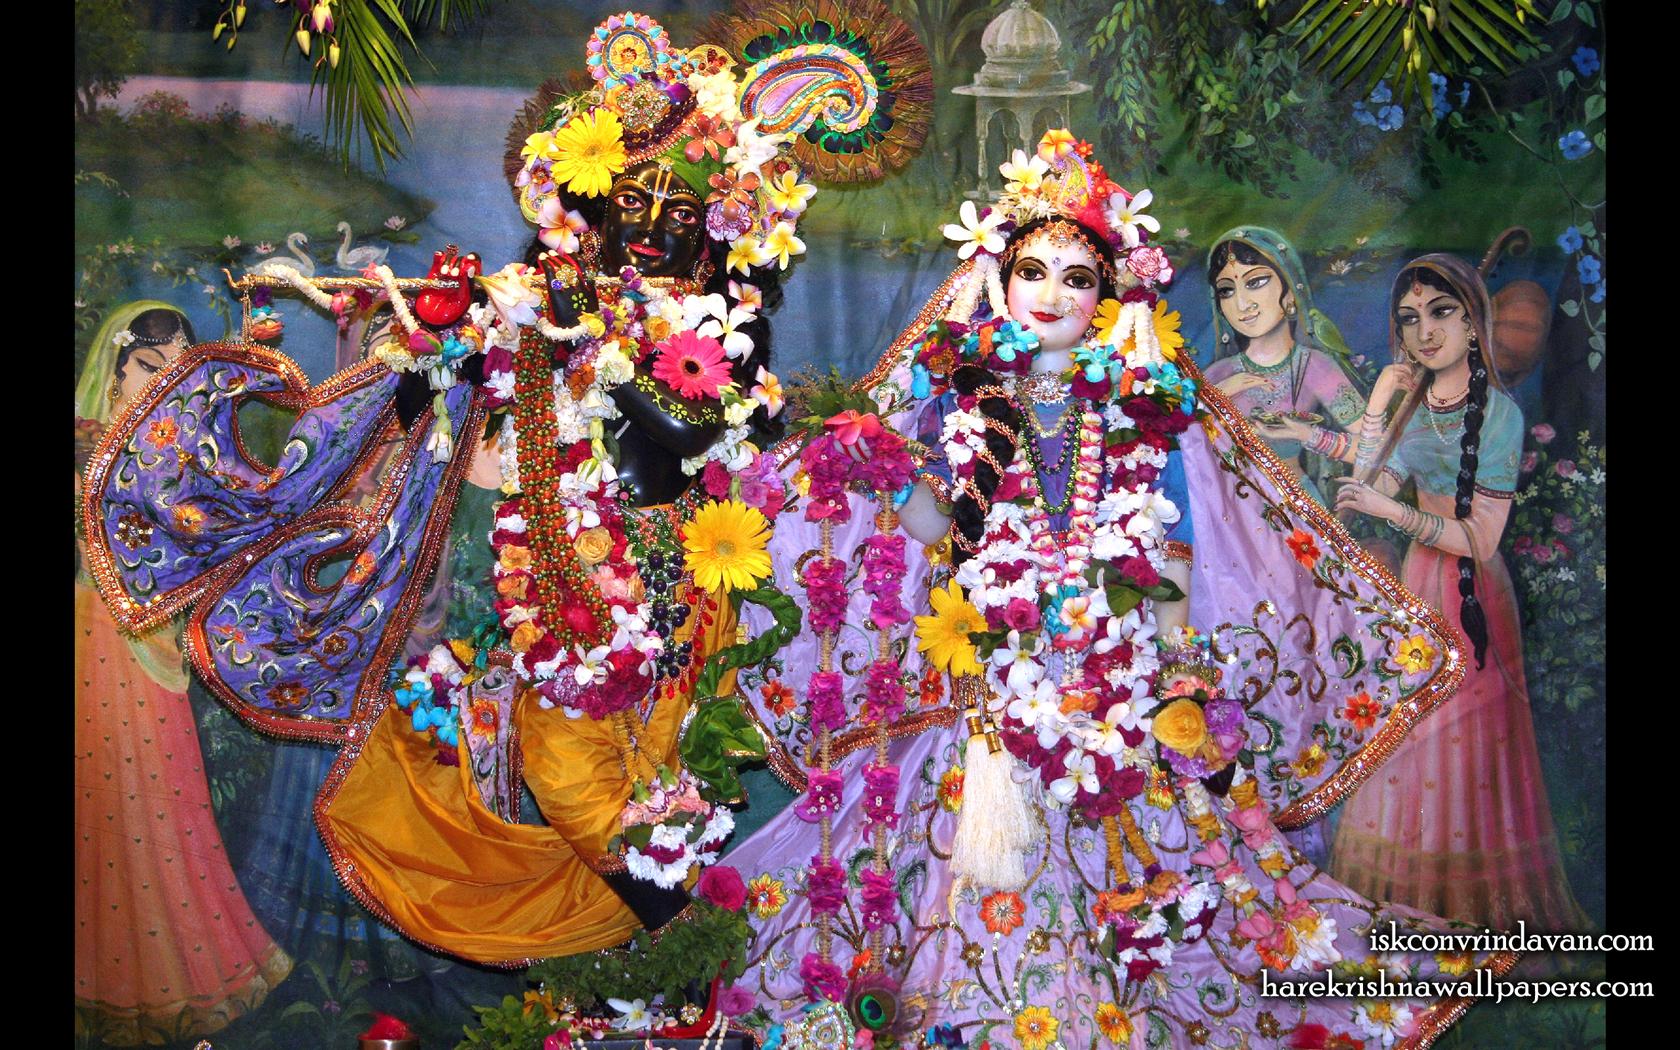 Sri Sri Radha Shyamsundar Wallpaper (014) Size 1680x1050 Download